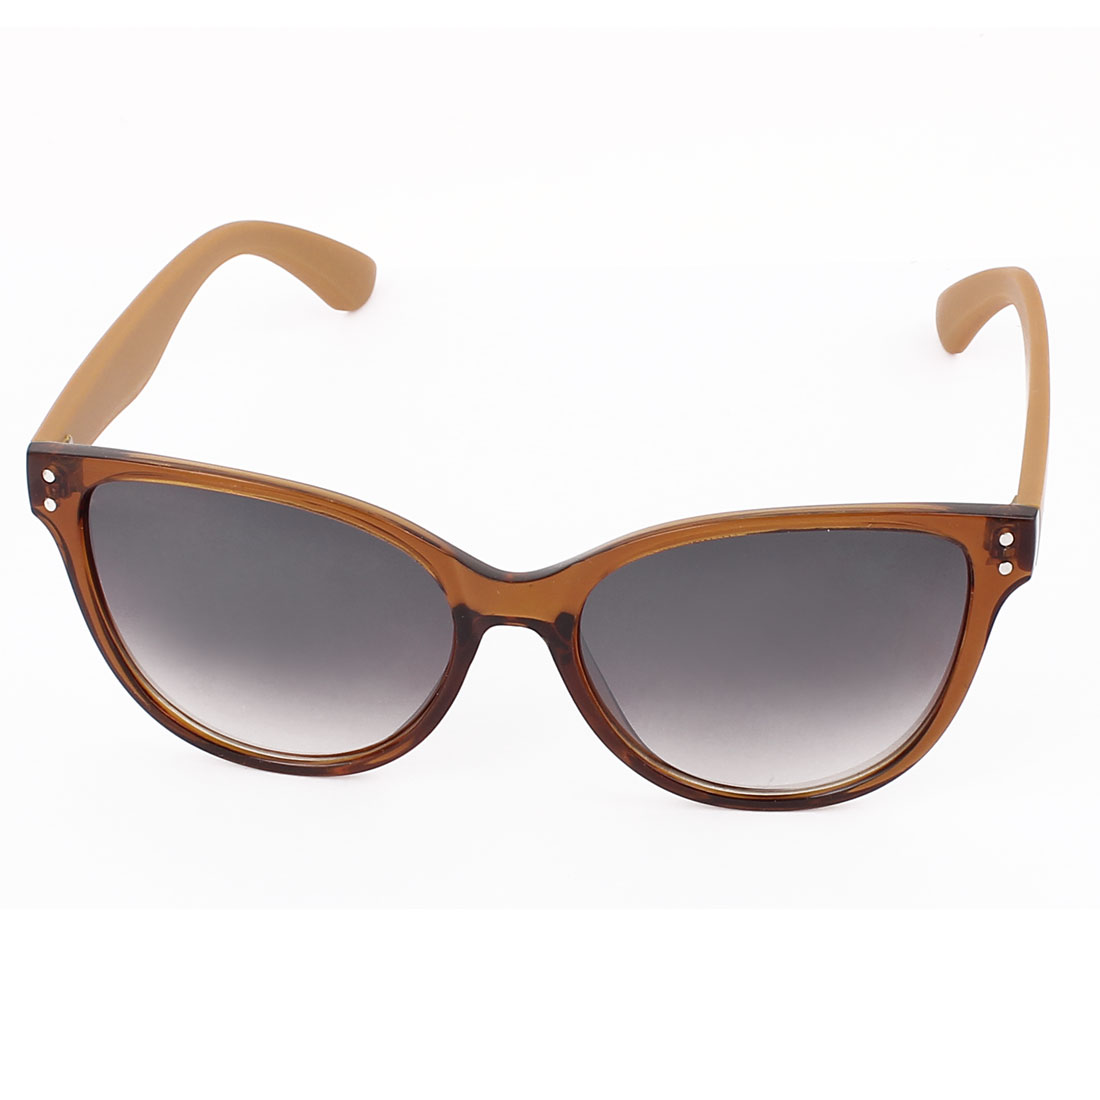 Unisex Single Bridge Plastic Full Rim Gradient Lens Sunglasses Eyeswear Glasses Eyes Protector Yellow